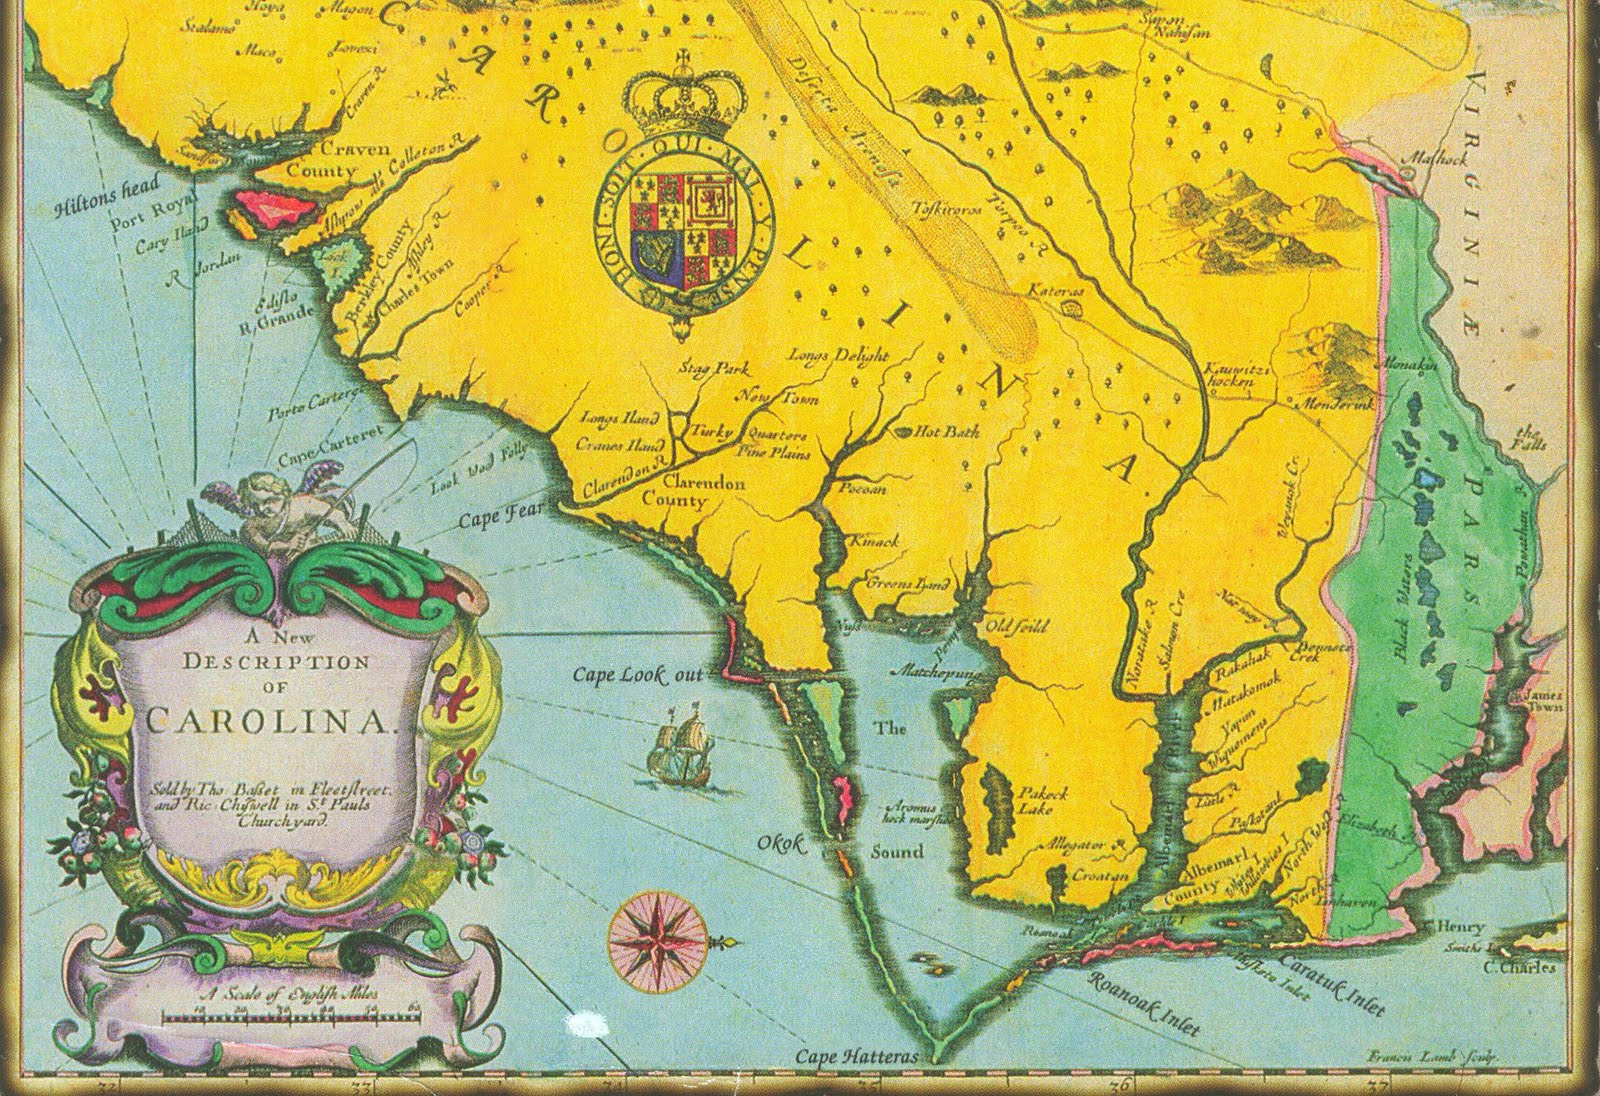 Vintage South Carolina Map.File Carolina Vintage Map Jpg Wikimedia Commons